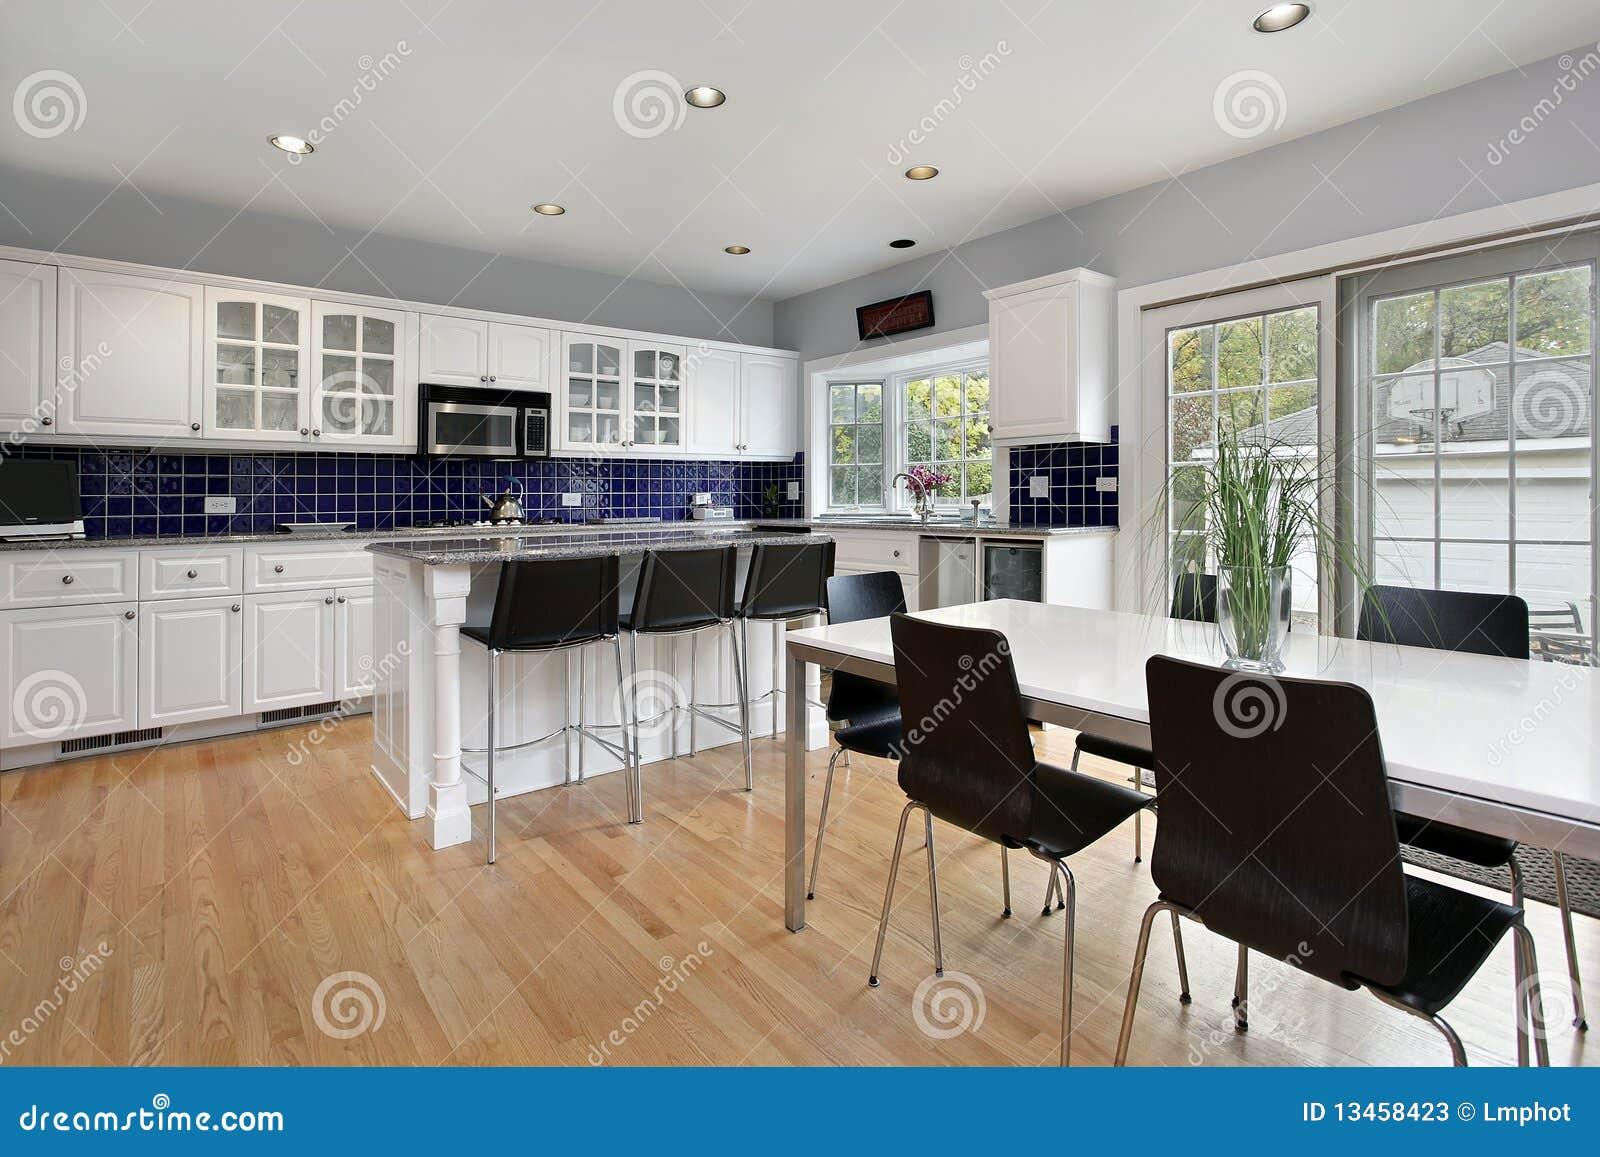 Keuken met blauwe tegel backsplash stock foto's   afbeelding: 13458423